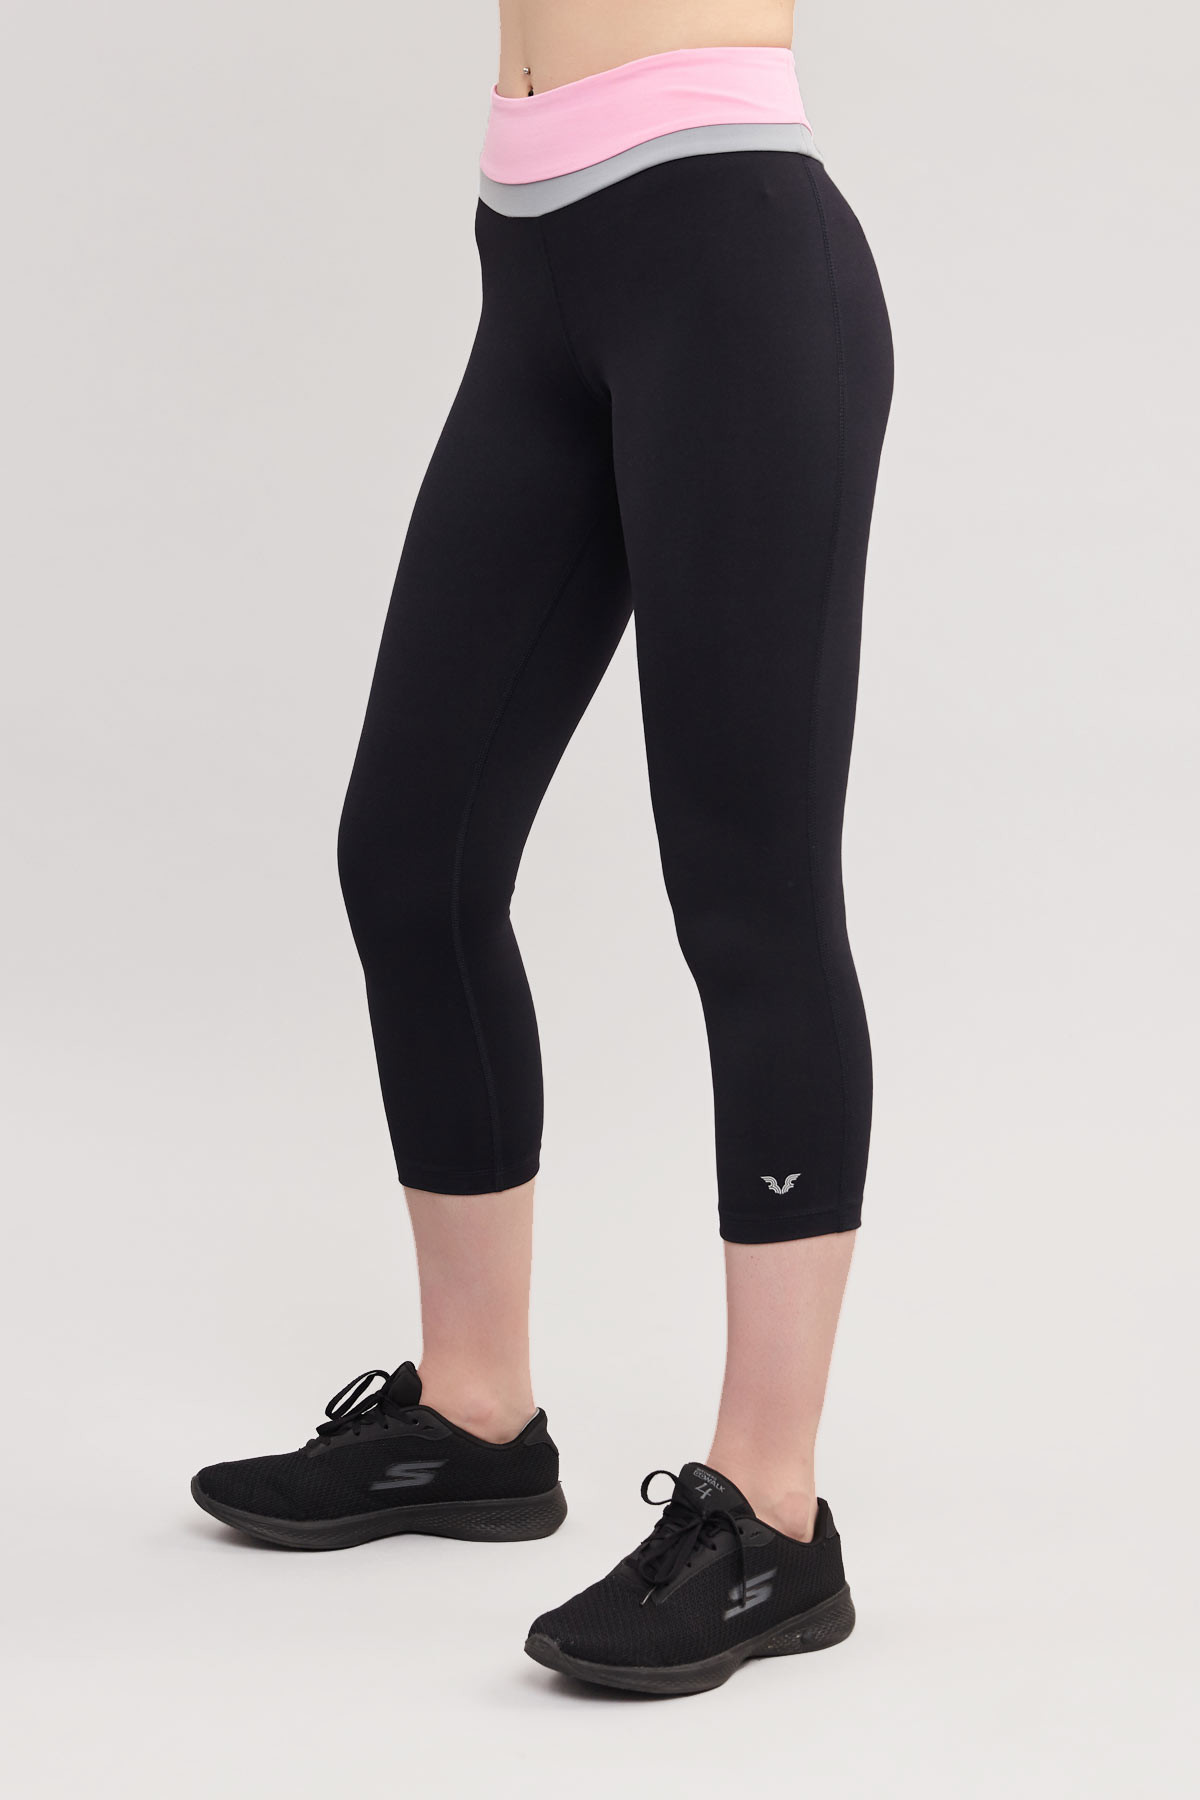 Bilcee Siyah 3/4 Kısa Sporcu Kadın Taytı BS-7118 BİLCEE